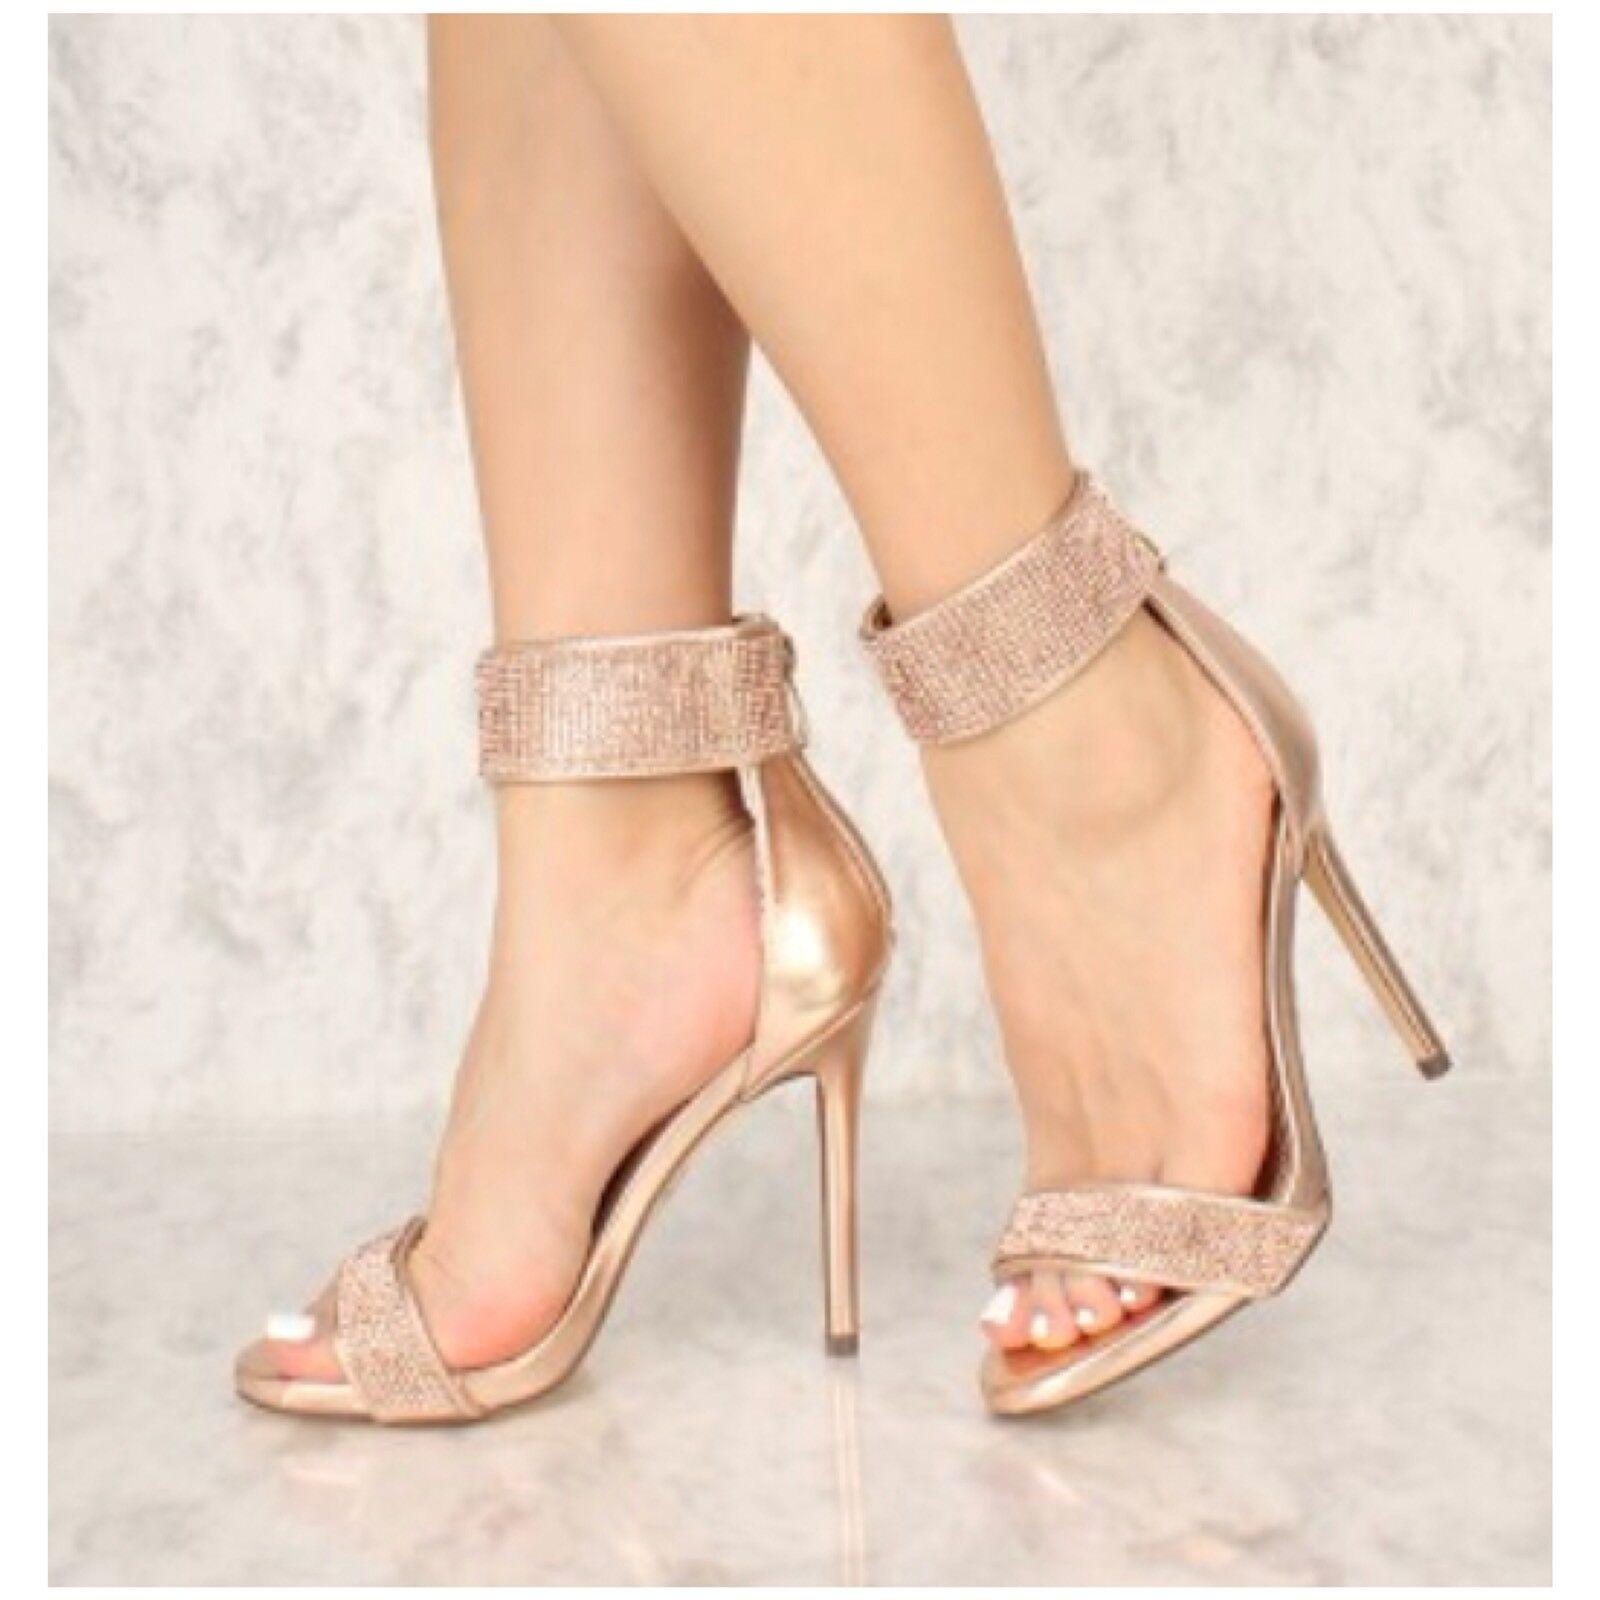 Liliana HOZZO-7 Rose Gold Open Toe Platform Ankle Strap Rhinestone Stiletto Heel